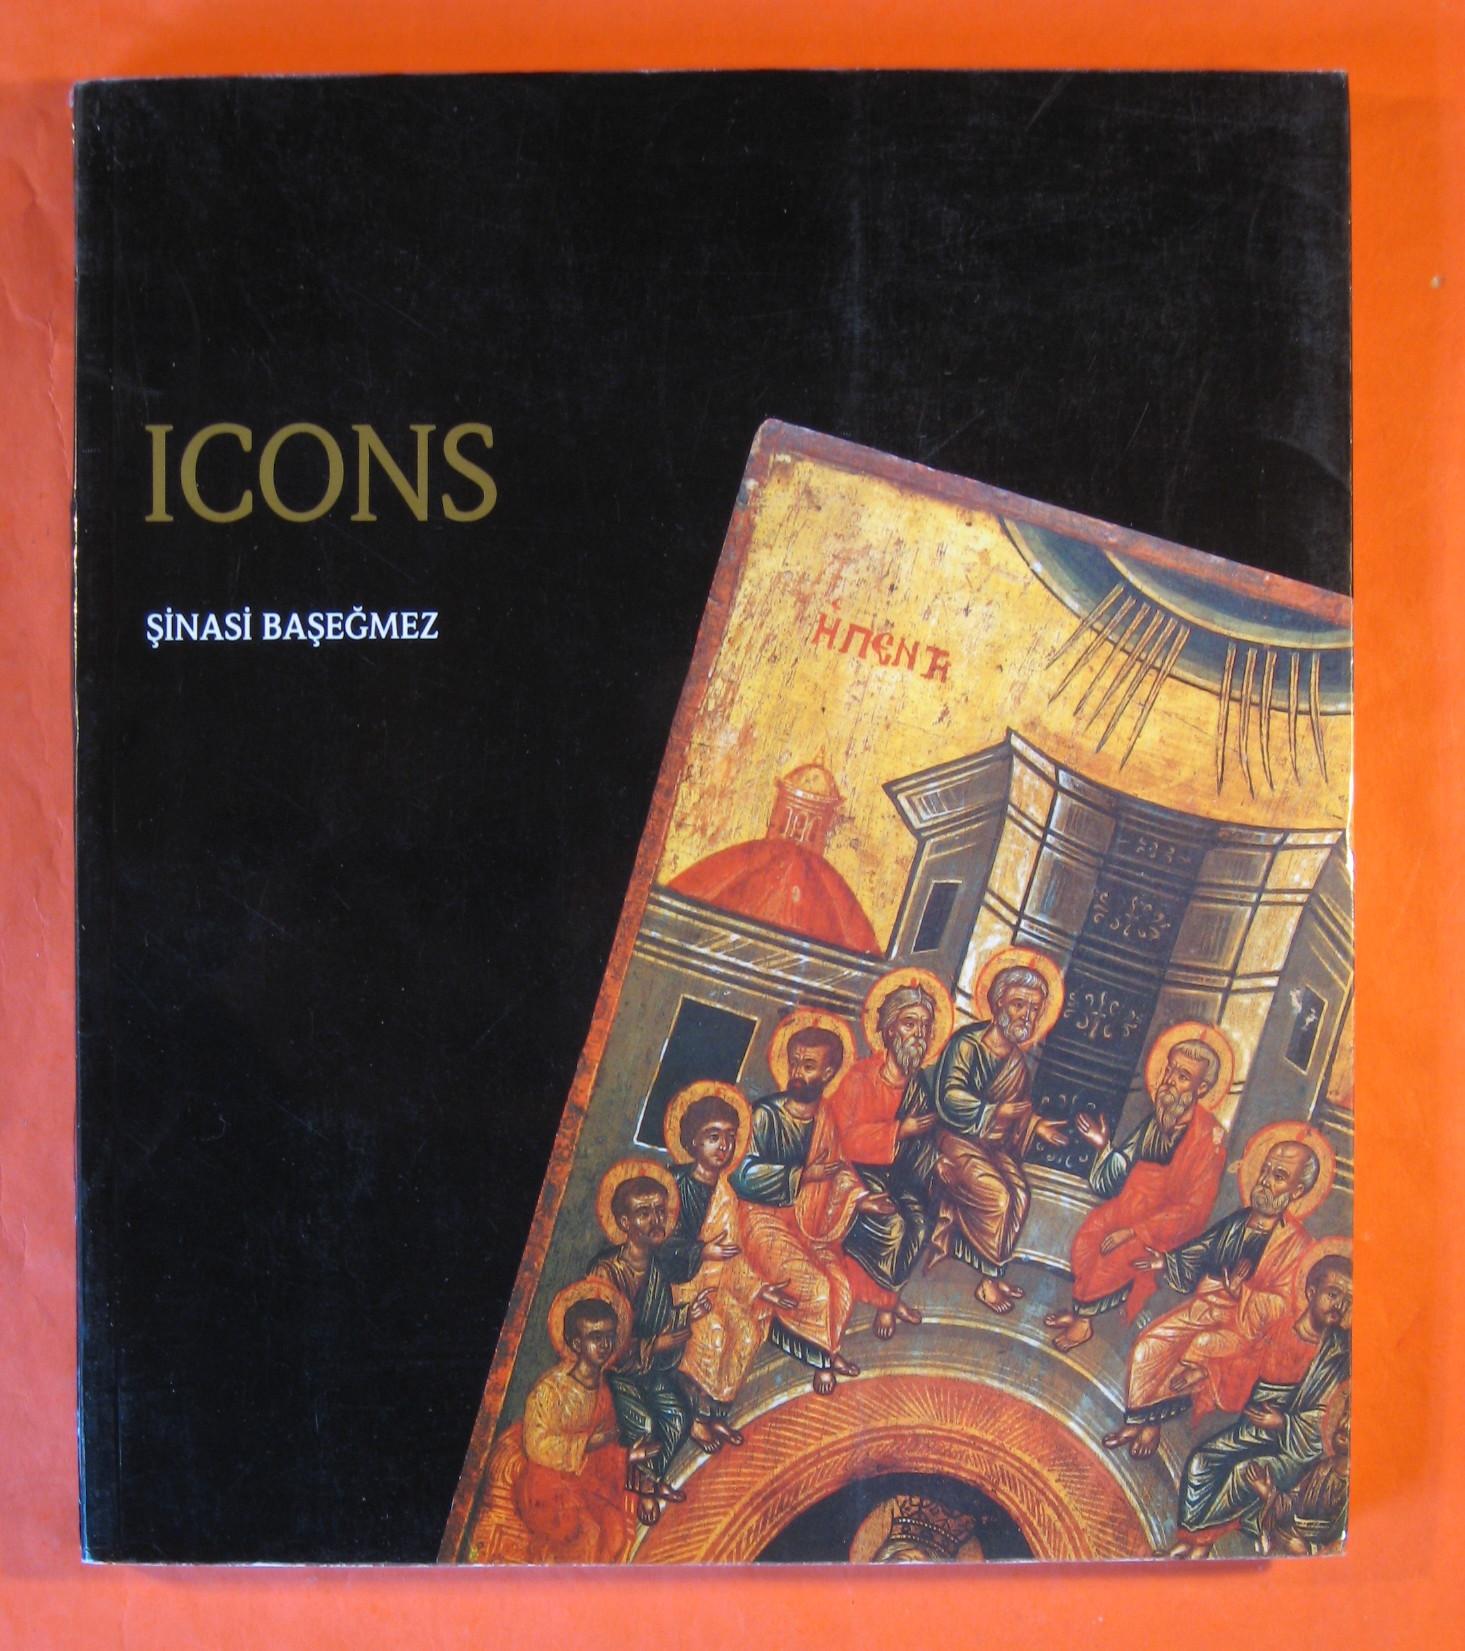 Icons: Selected Icons From Sophia Saint Museum, Basegmez, Sinasi